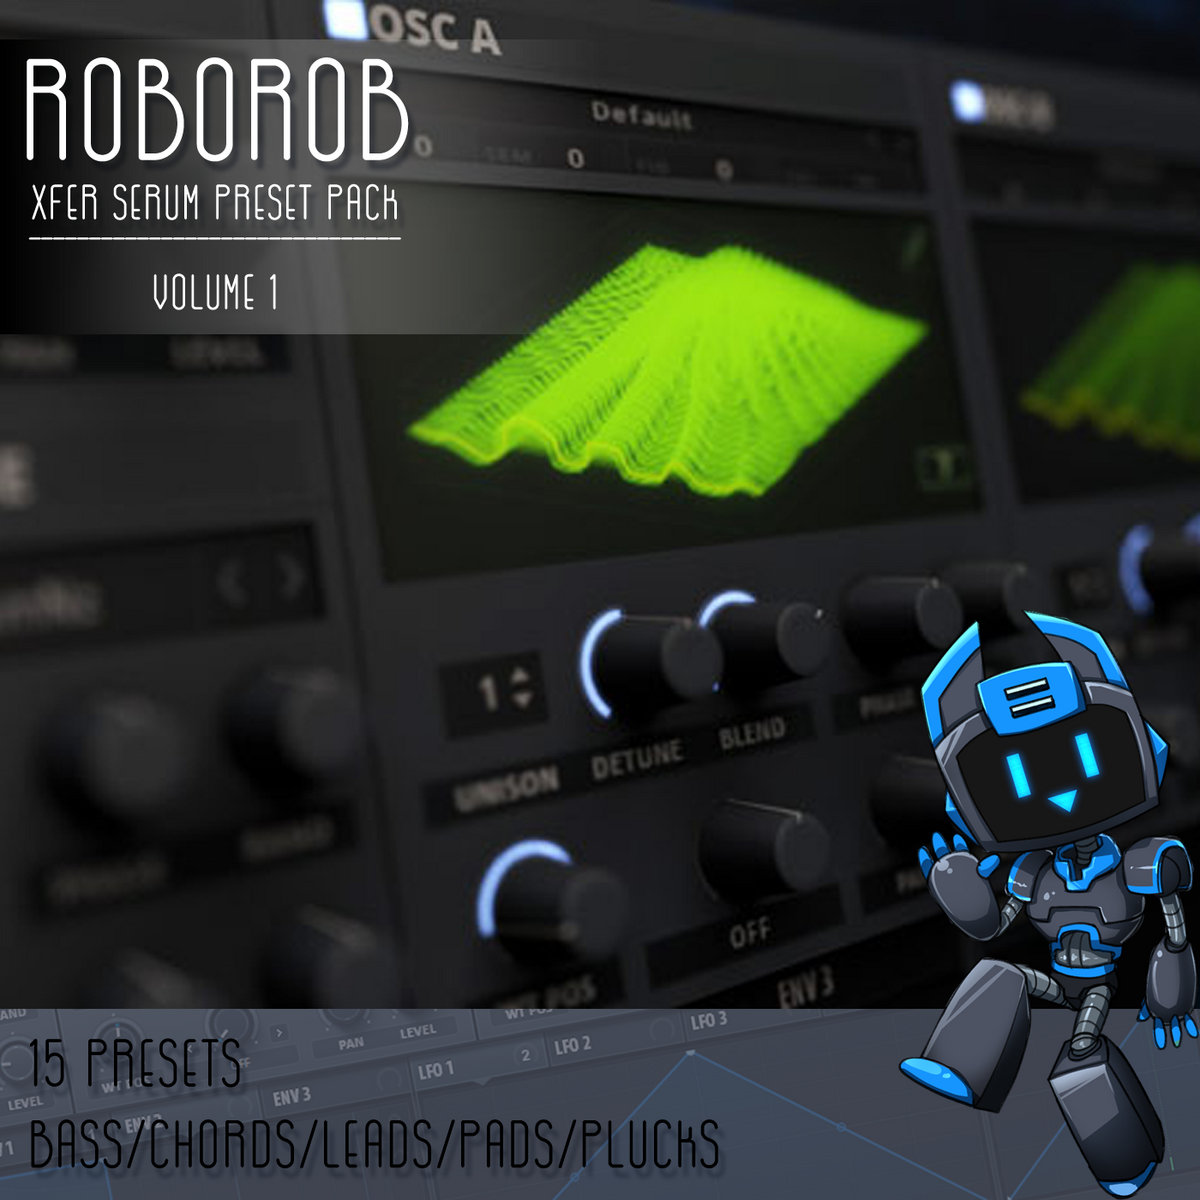 RoboRob Serum Presets Volume 1 | RoboRob